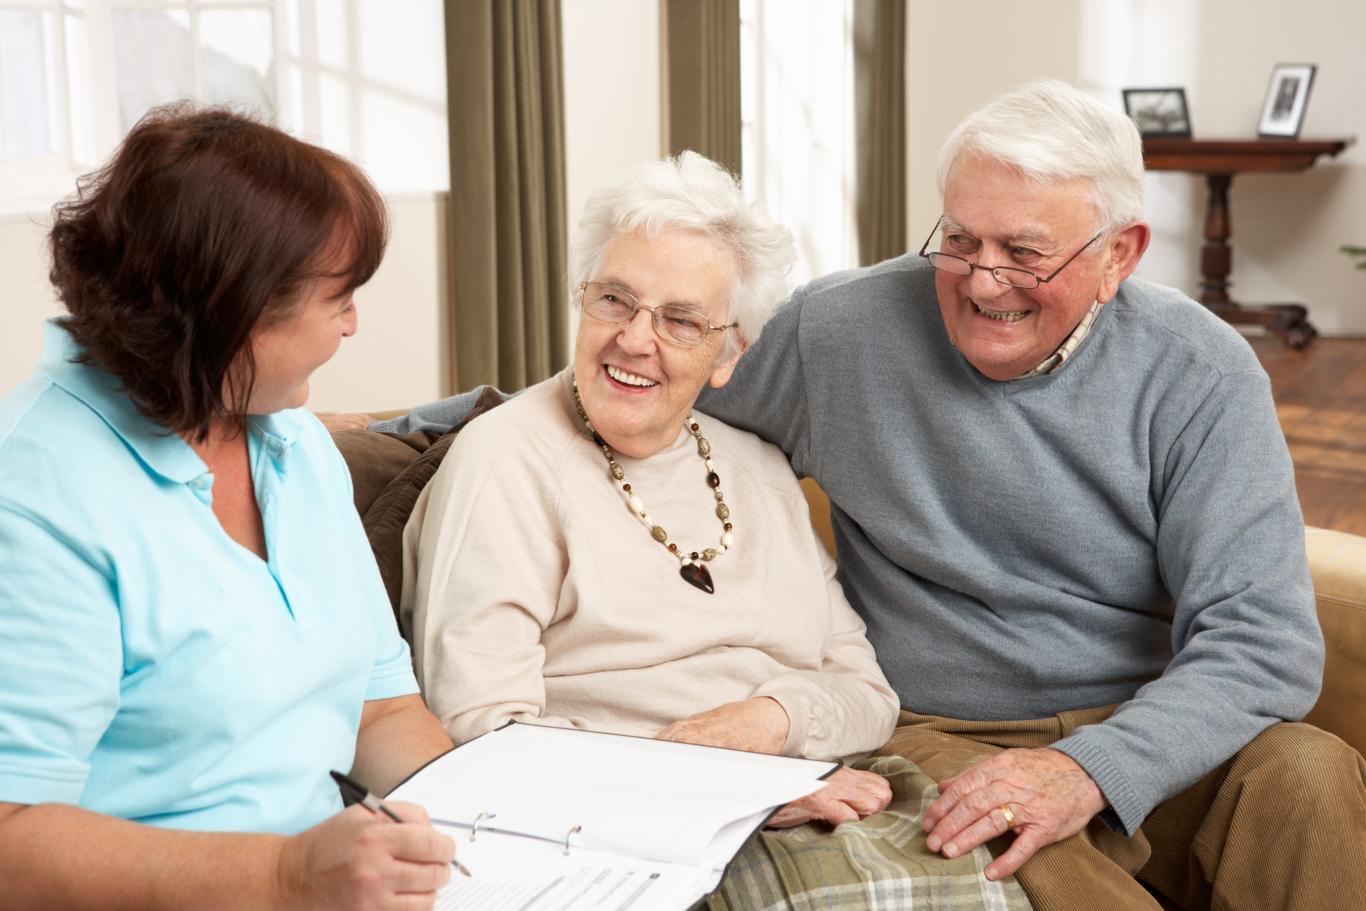 Personas mayores sentadas